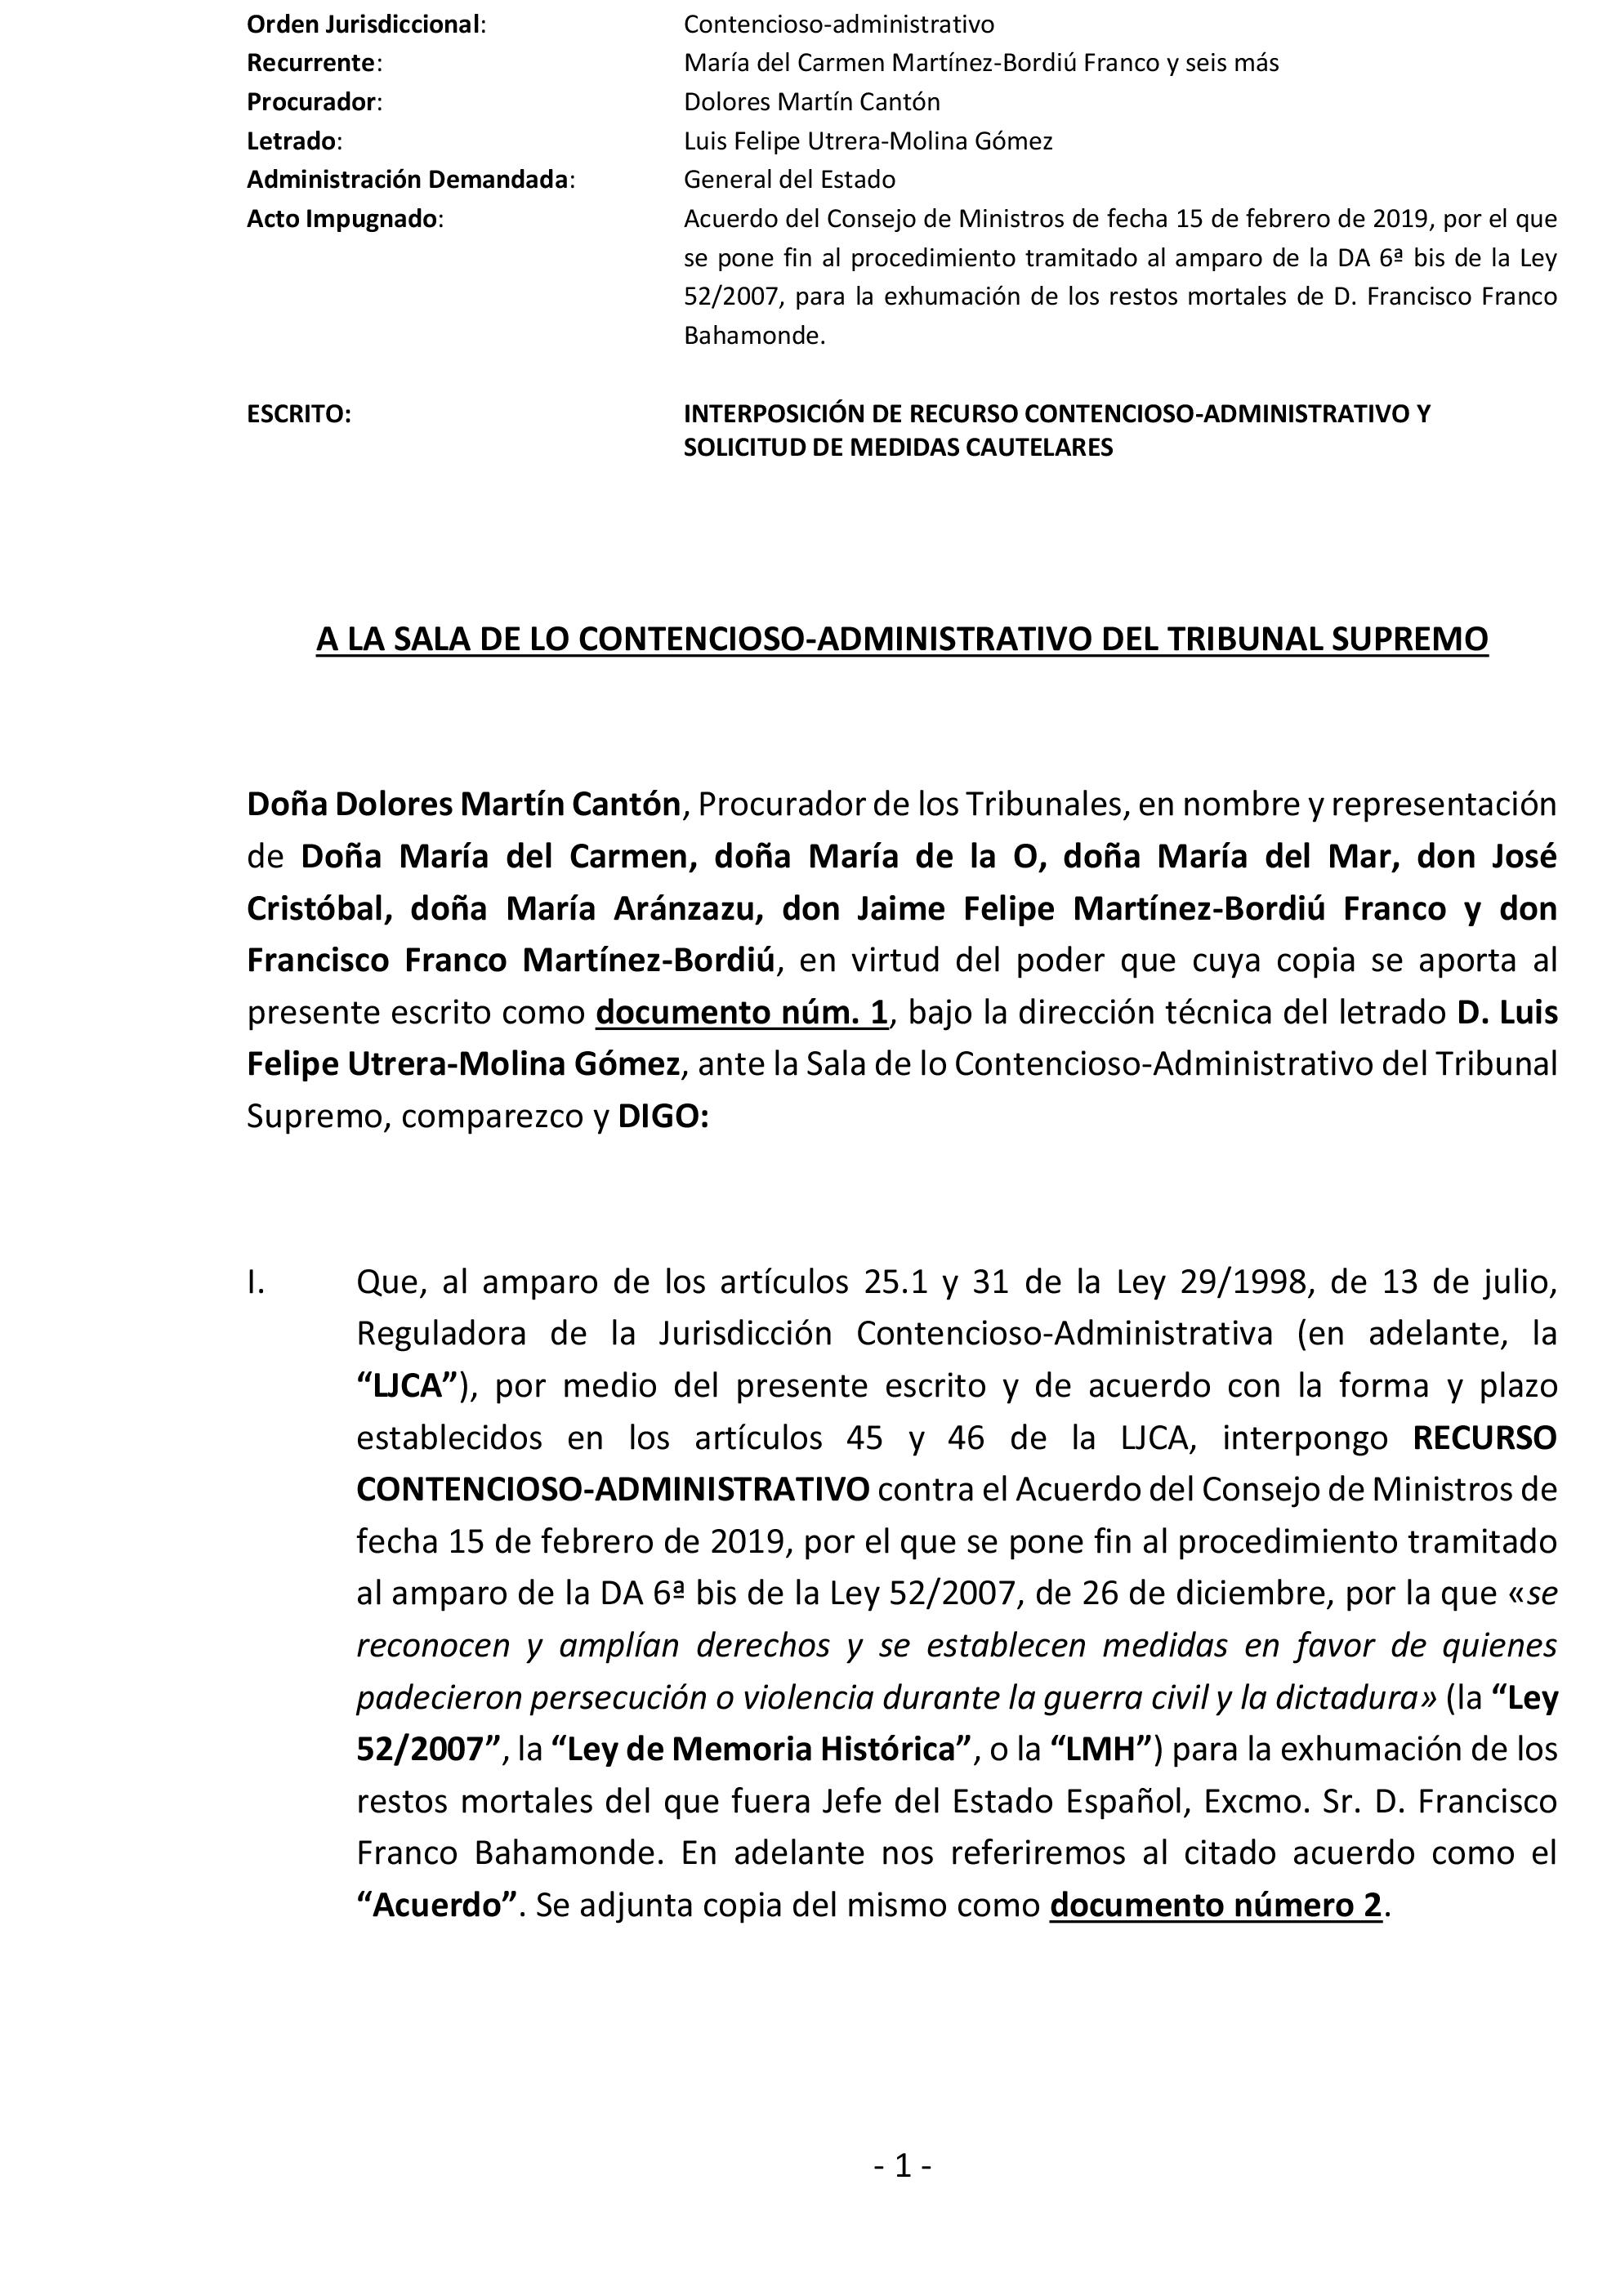 Contencioso-Admin_Franco-1